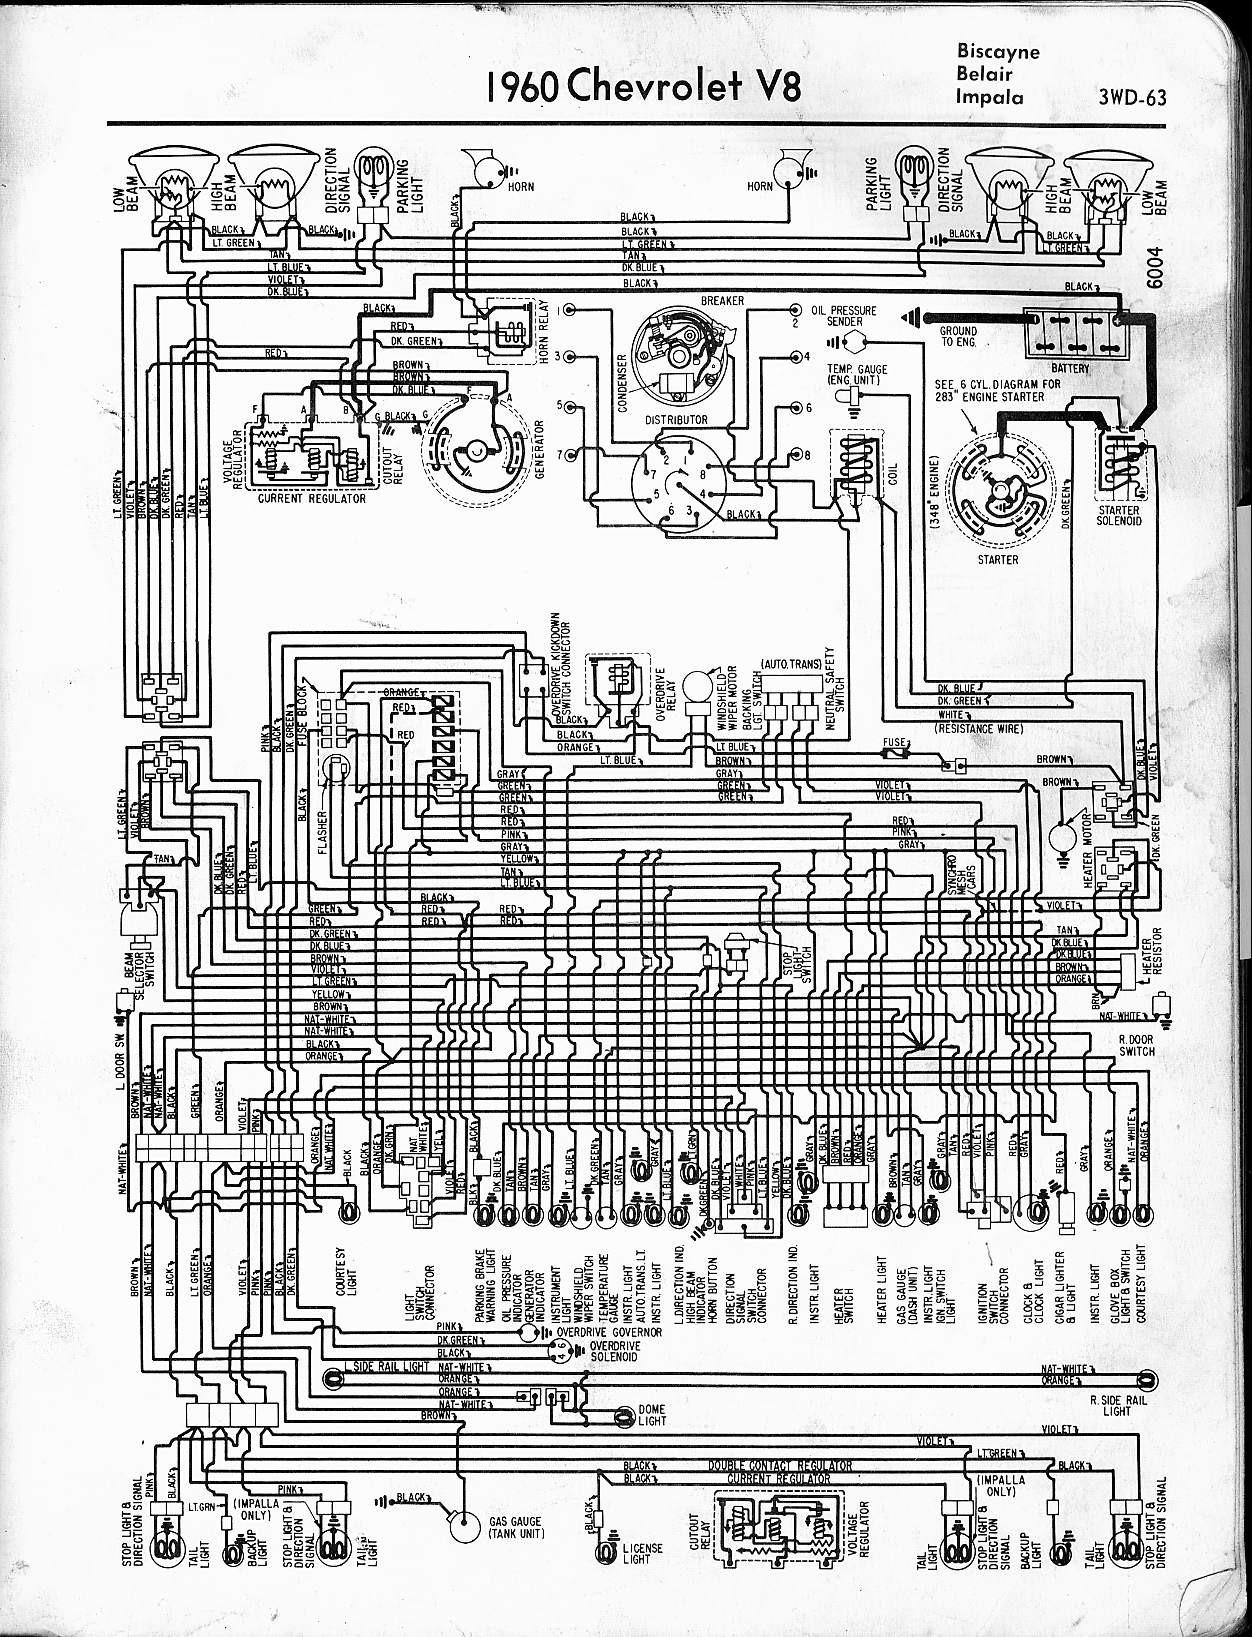 2001 Chevy Malibu 3 1 Engine Diagram 57 65 Chevy Wiring Diagrams Of 2001  Chevy Malibu